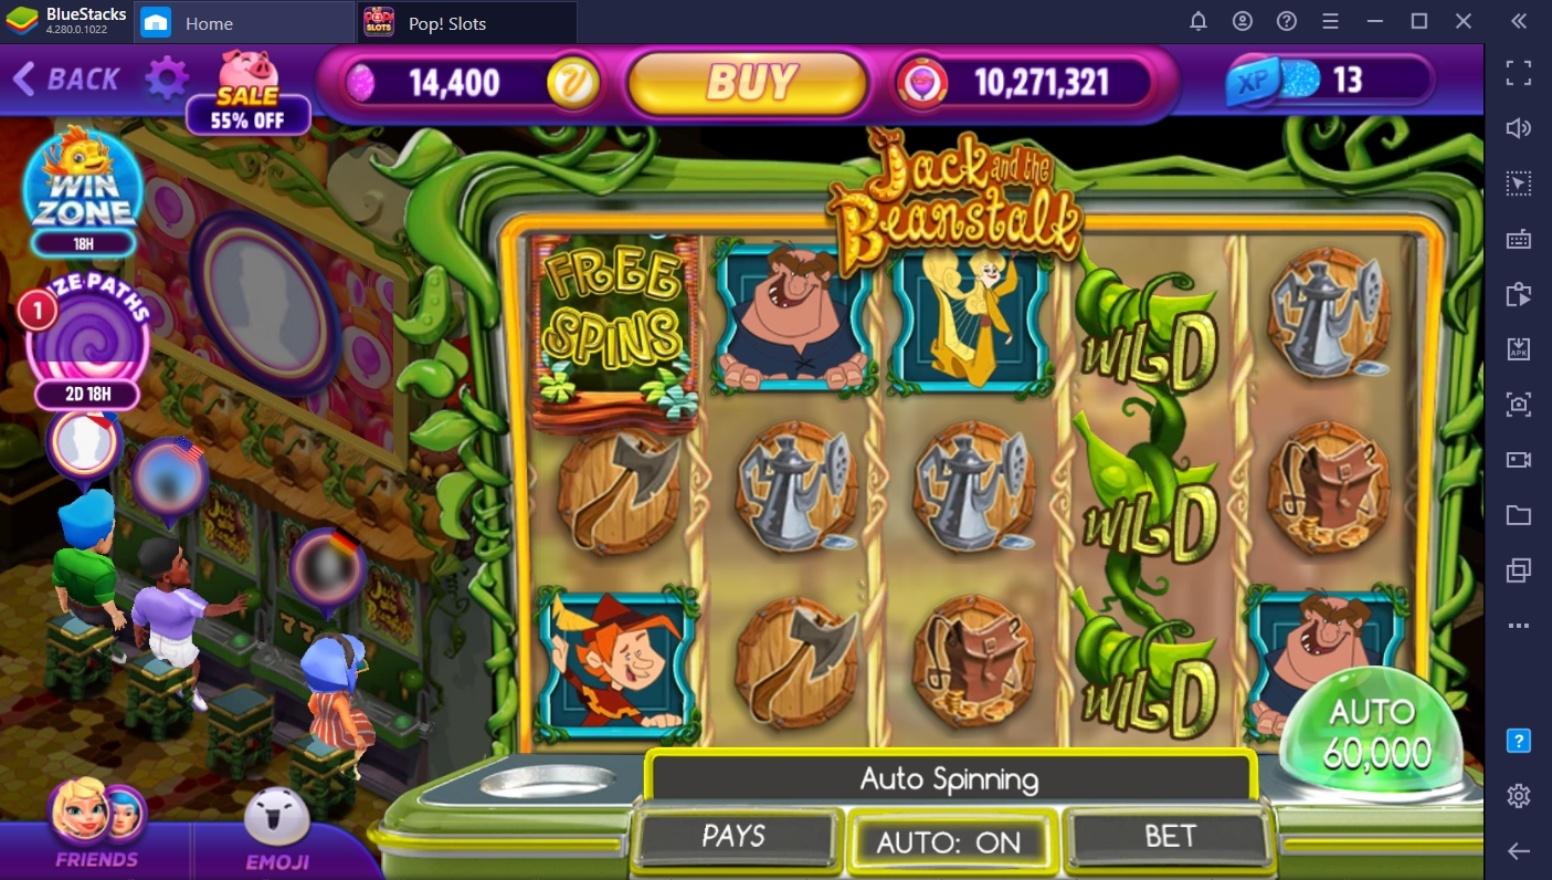 Beginner's Guide to Playing POP! Slots Casino | BlueStacks